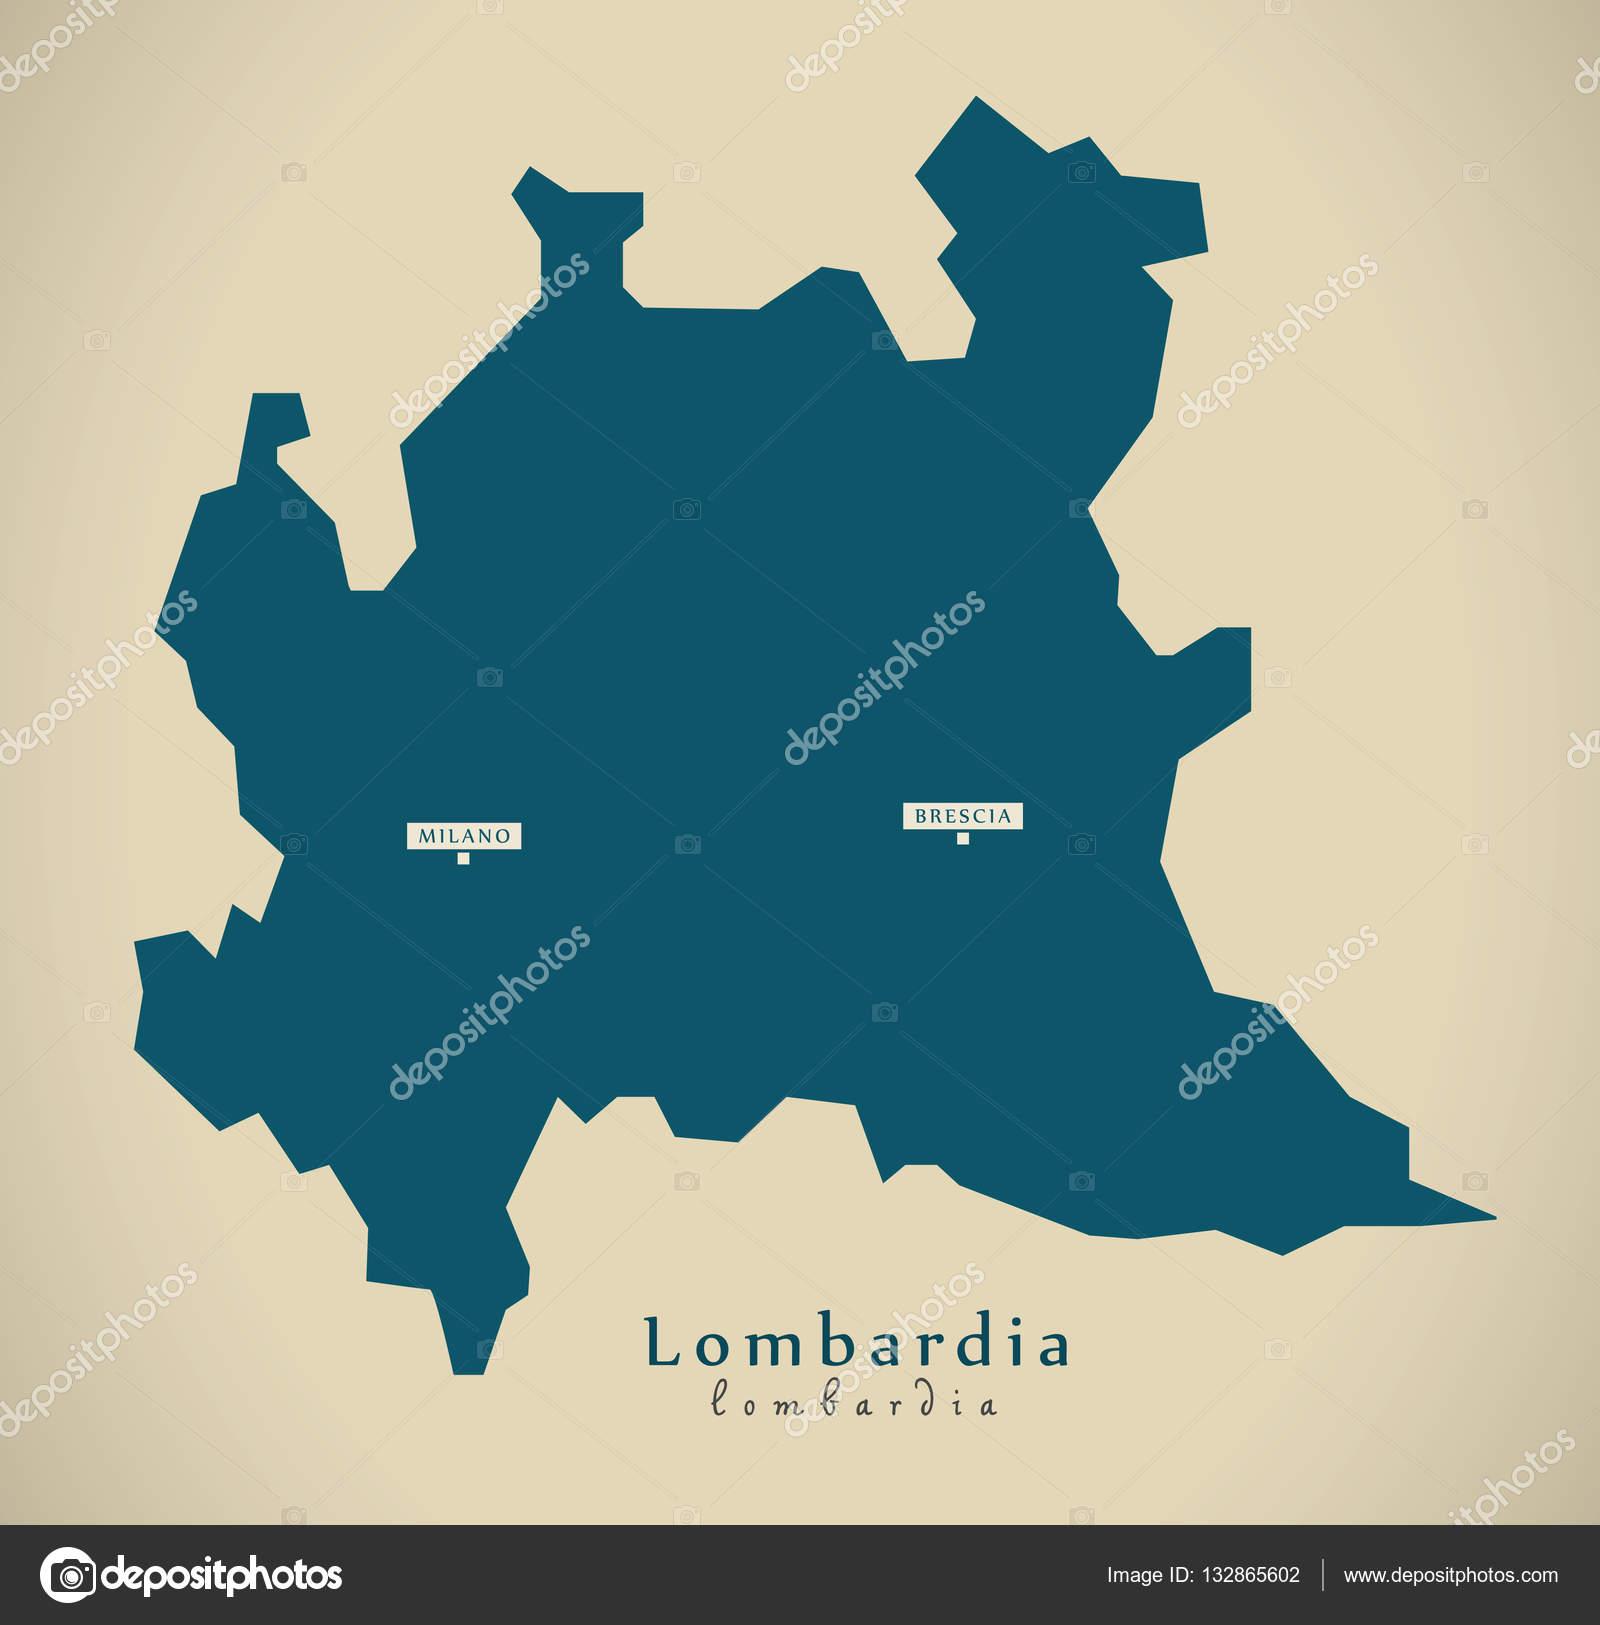 Mapa moderno it lombardia italia foto de stock ingomenhard mapa moderno it lombardia italia foto de stock gumiabroncs Choice Image